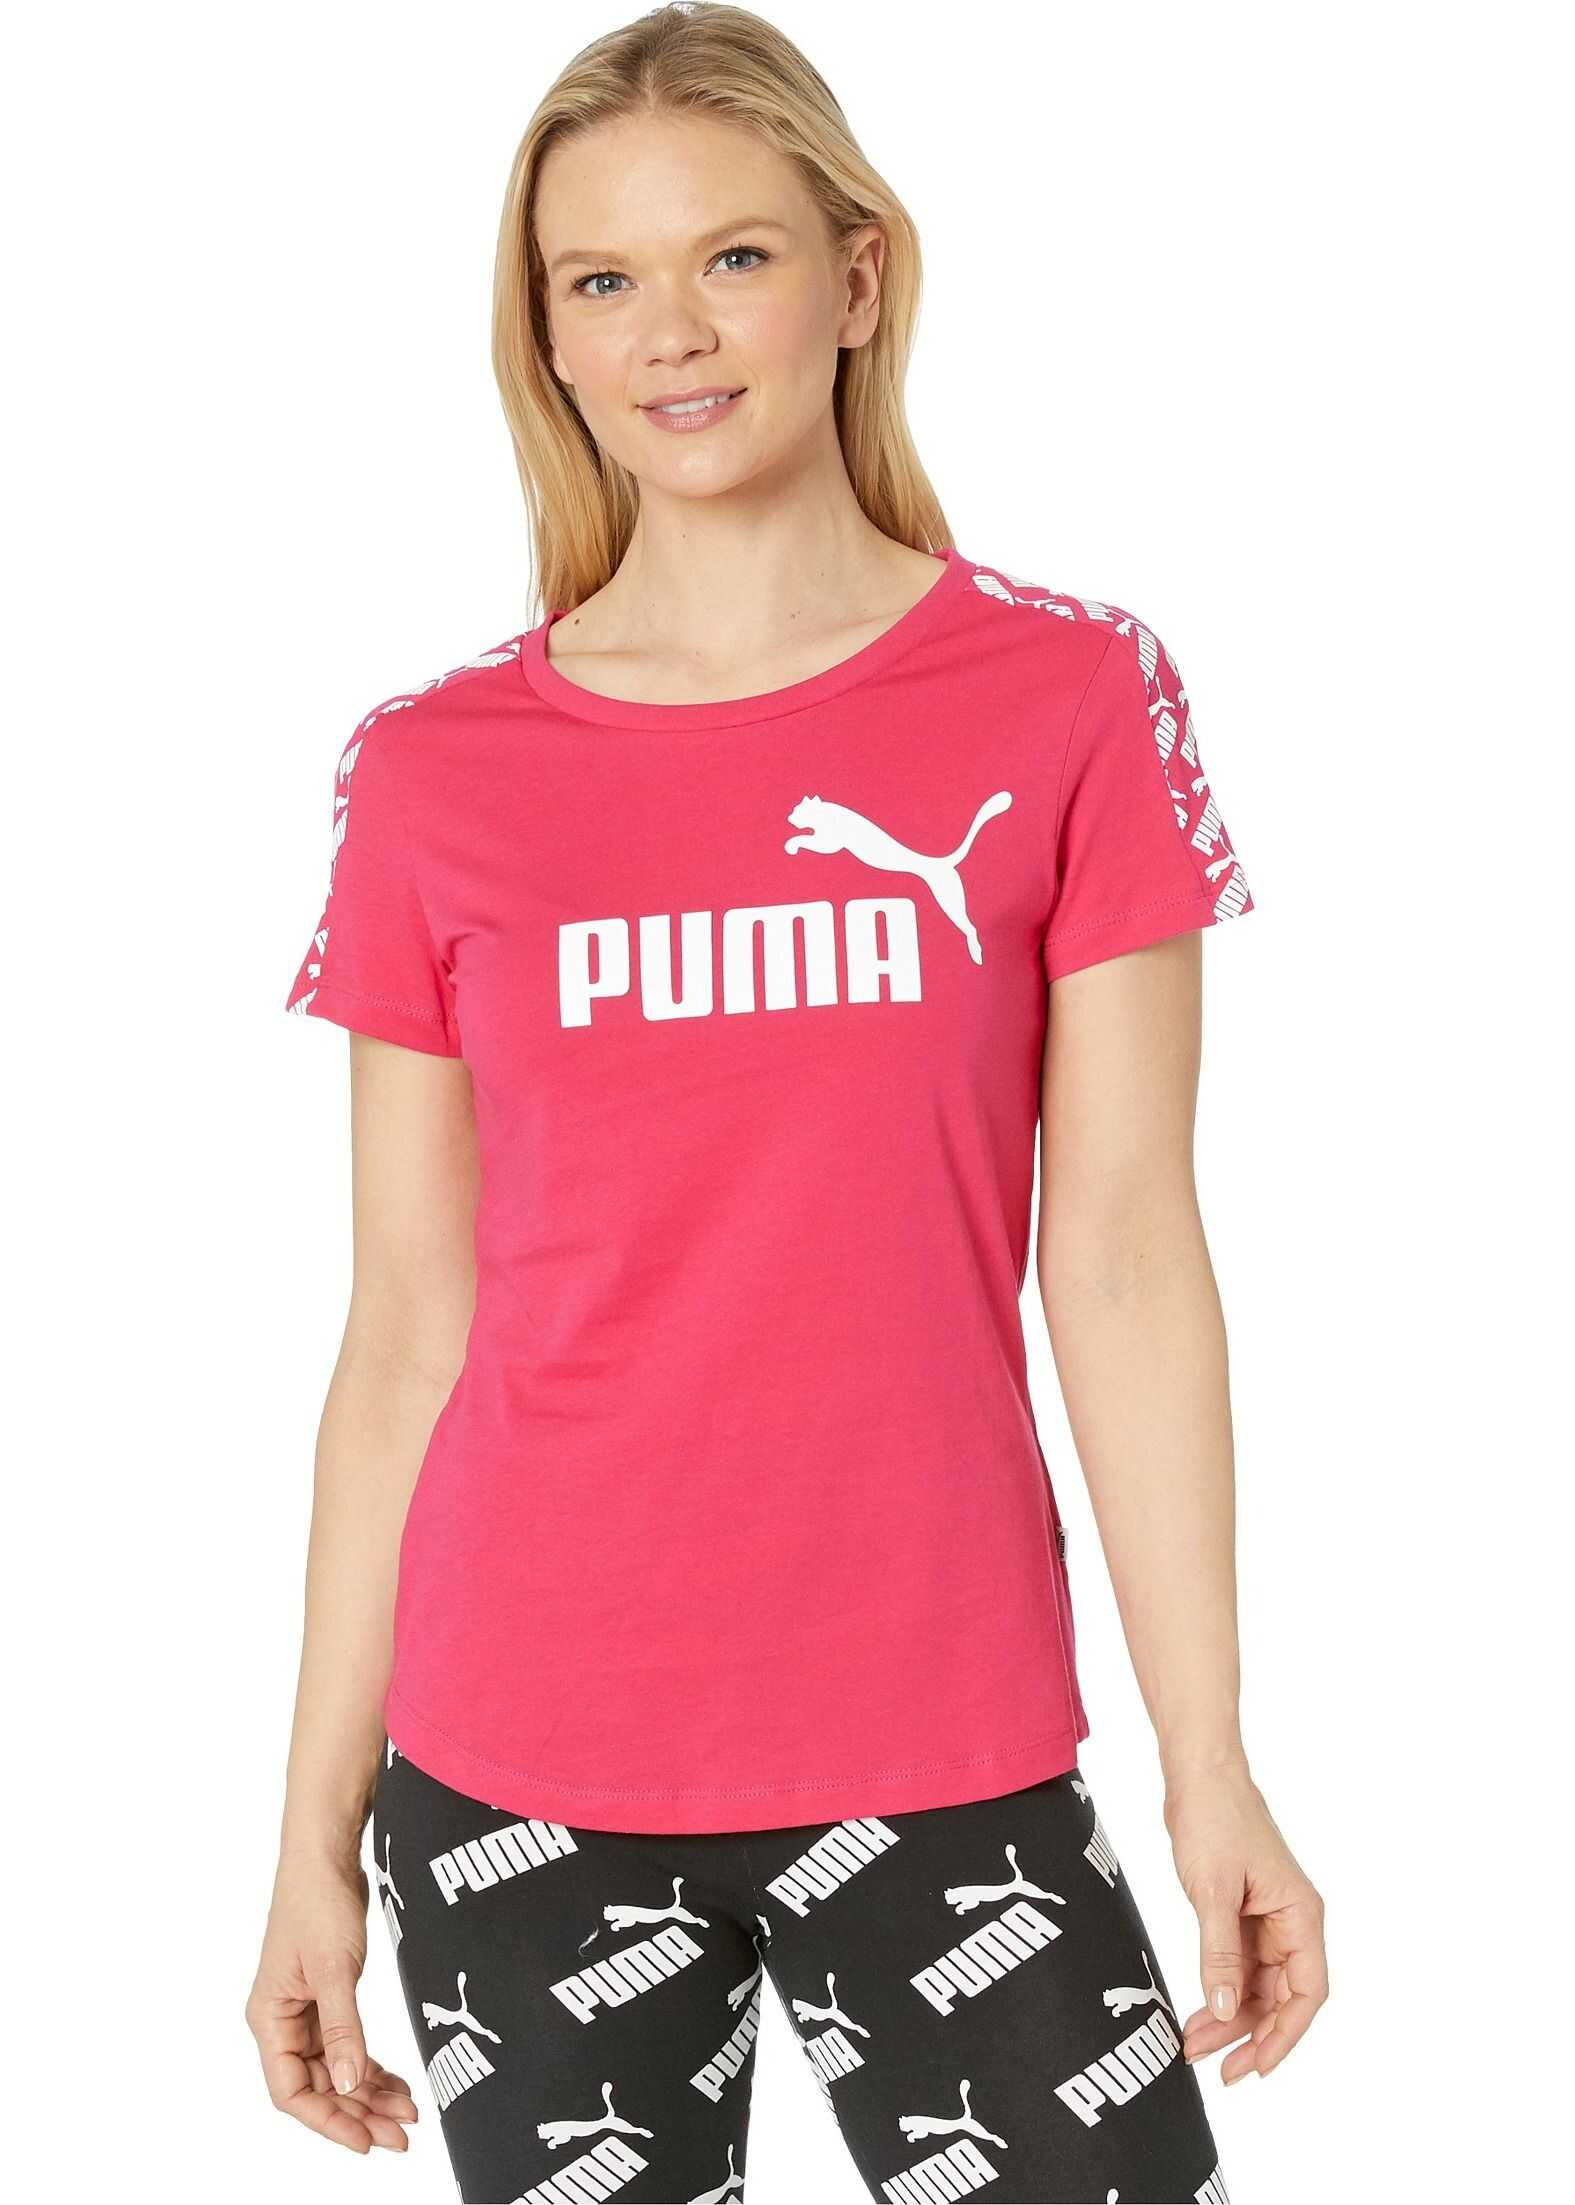 PUMA Amplified Tee Bright Rose